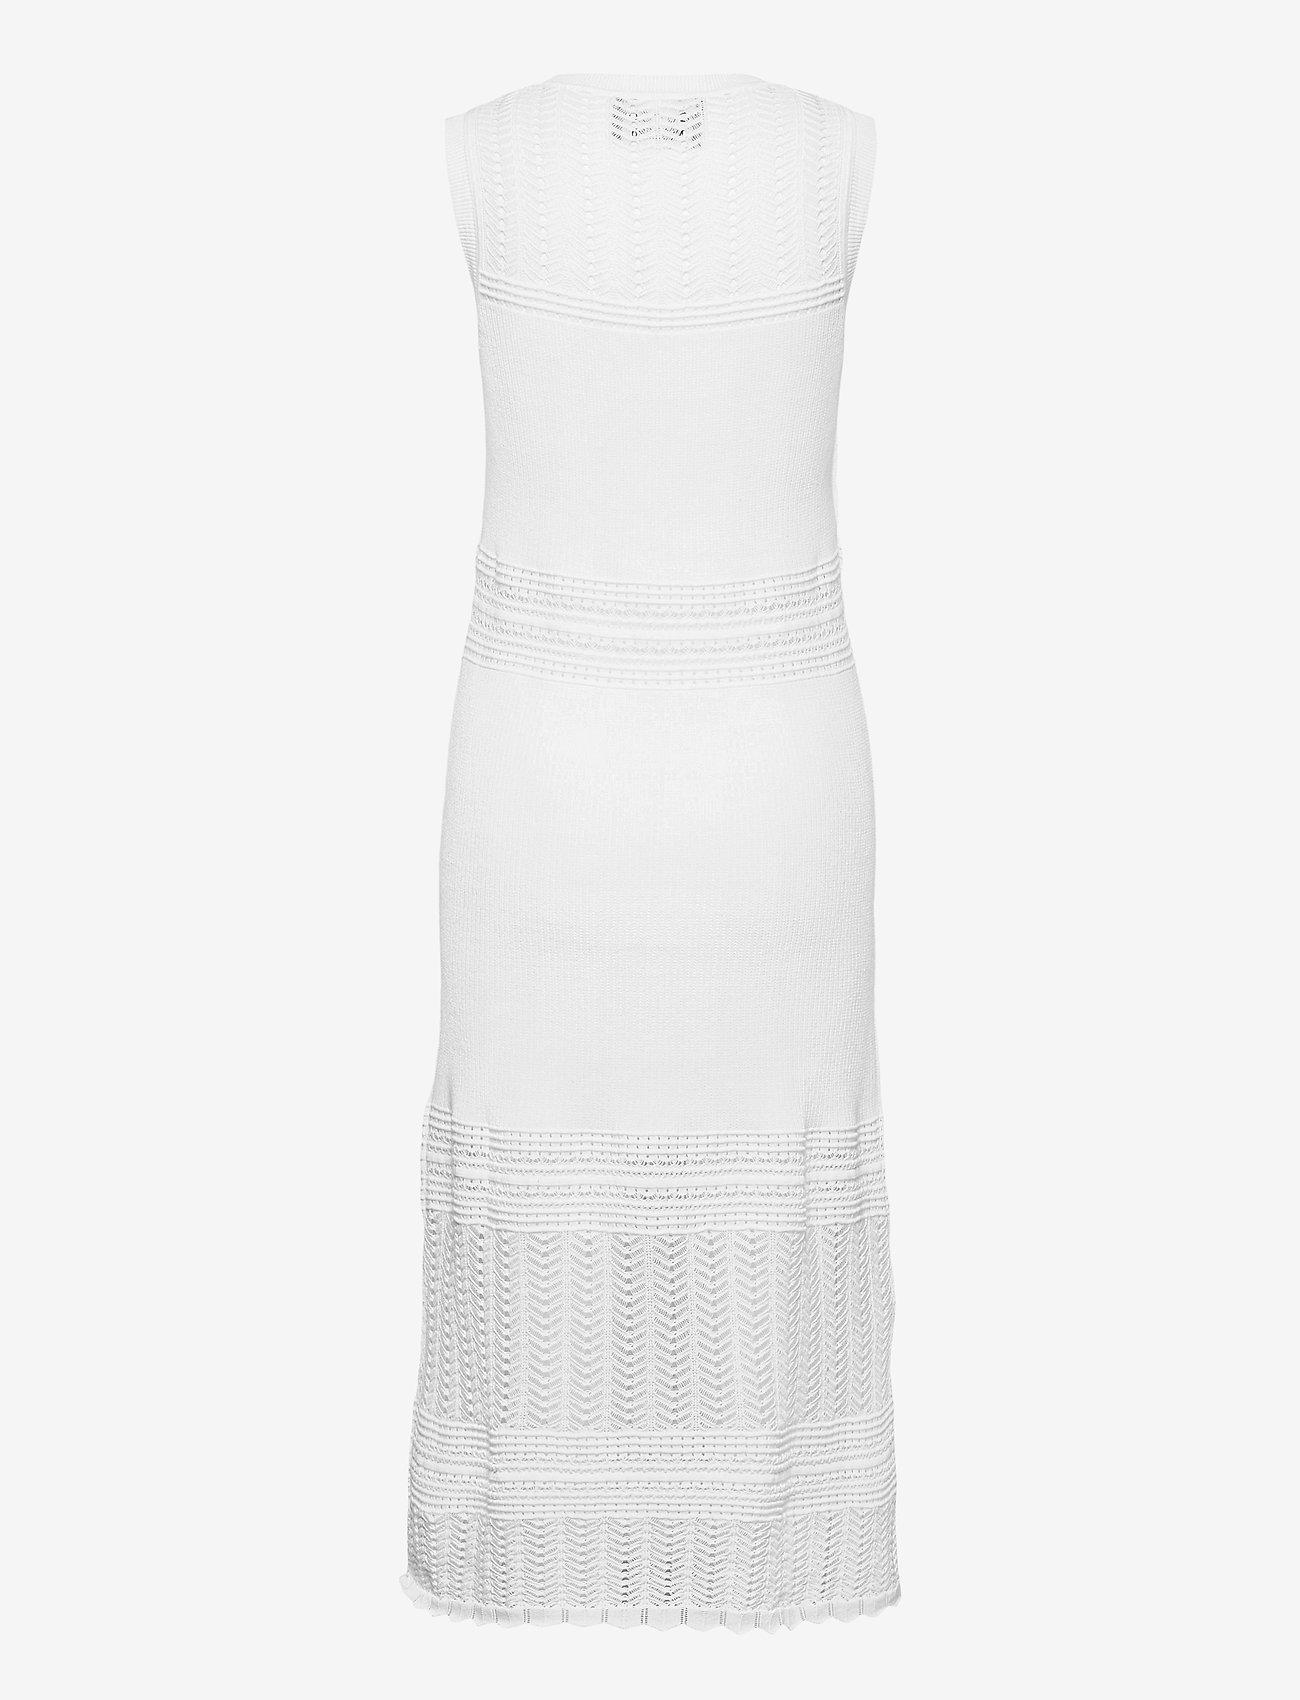 Boutique Moschino - Boutique Moschino LONG DRESS - sommerkjoler - white - 1